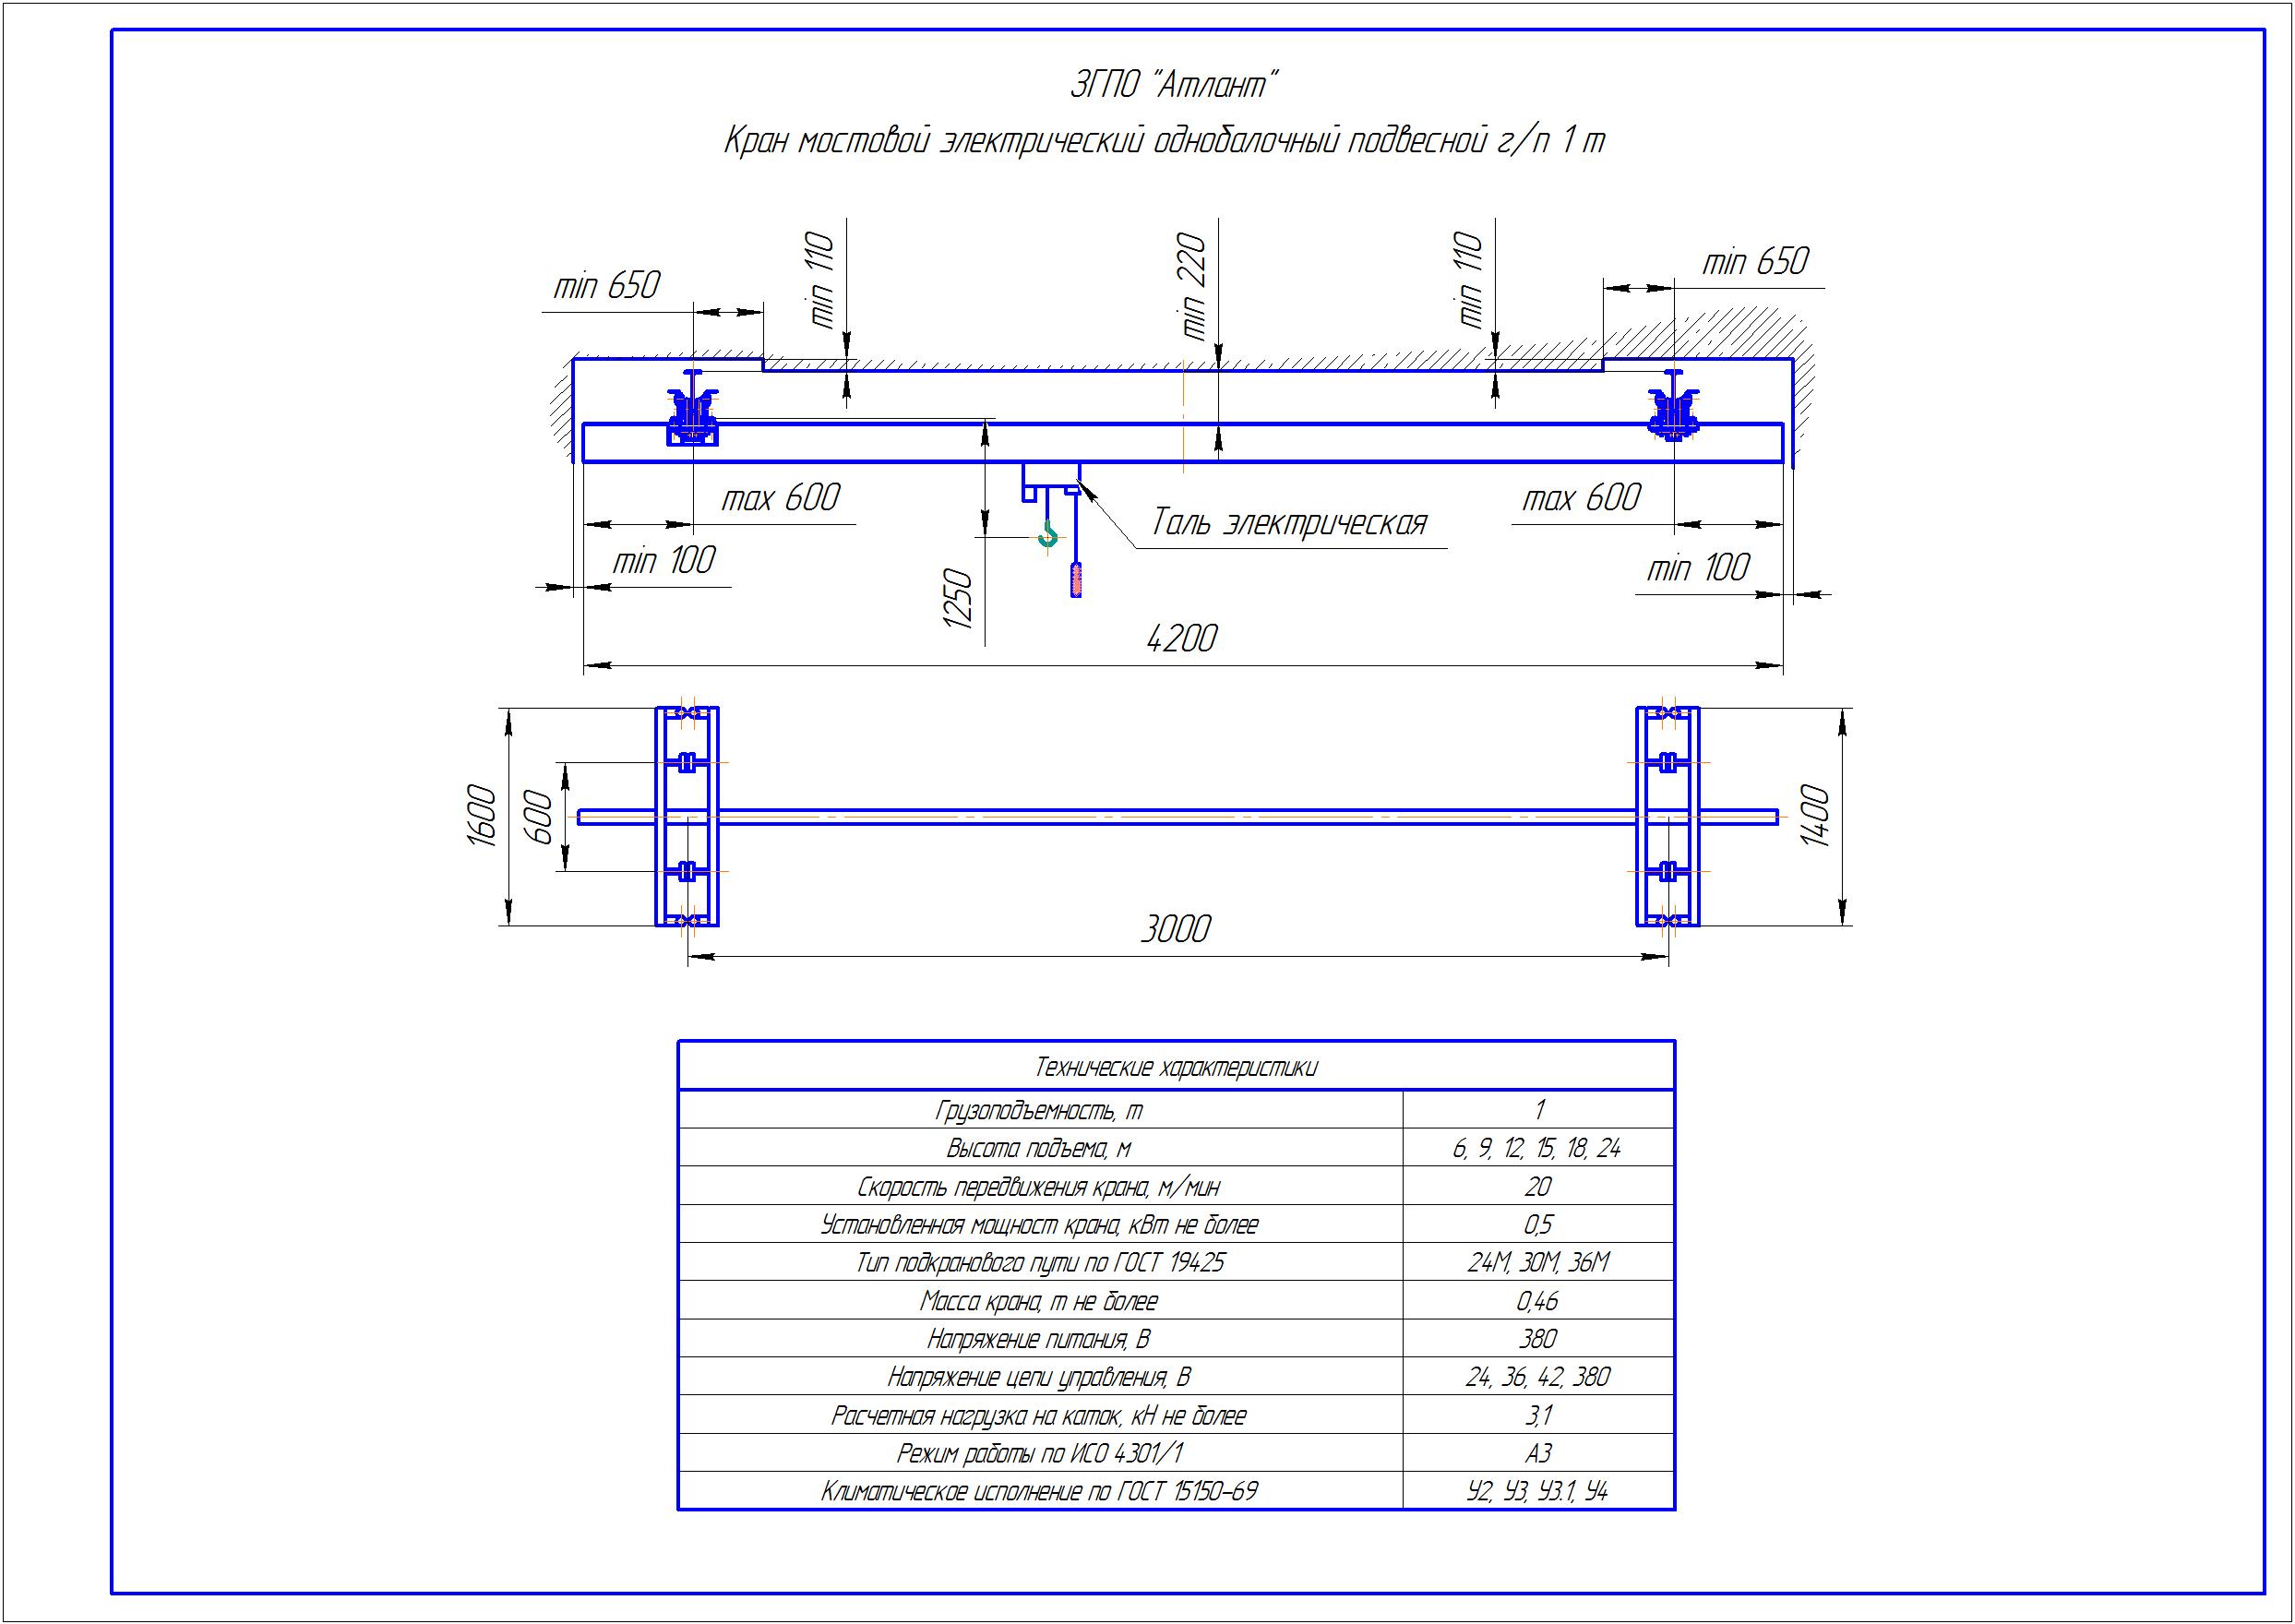 KBP 1 1 1 - Подвесная кран балка